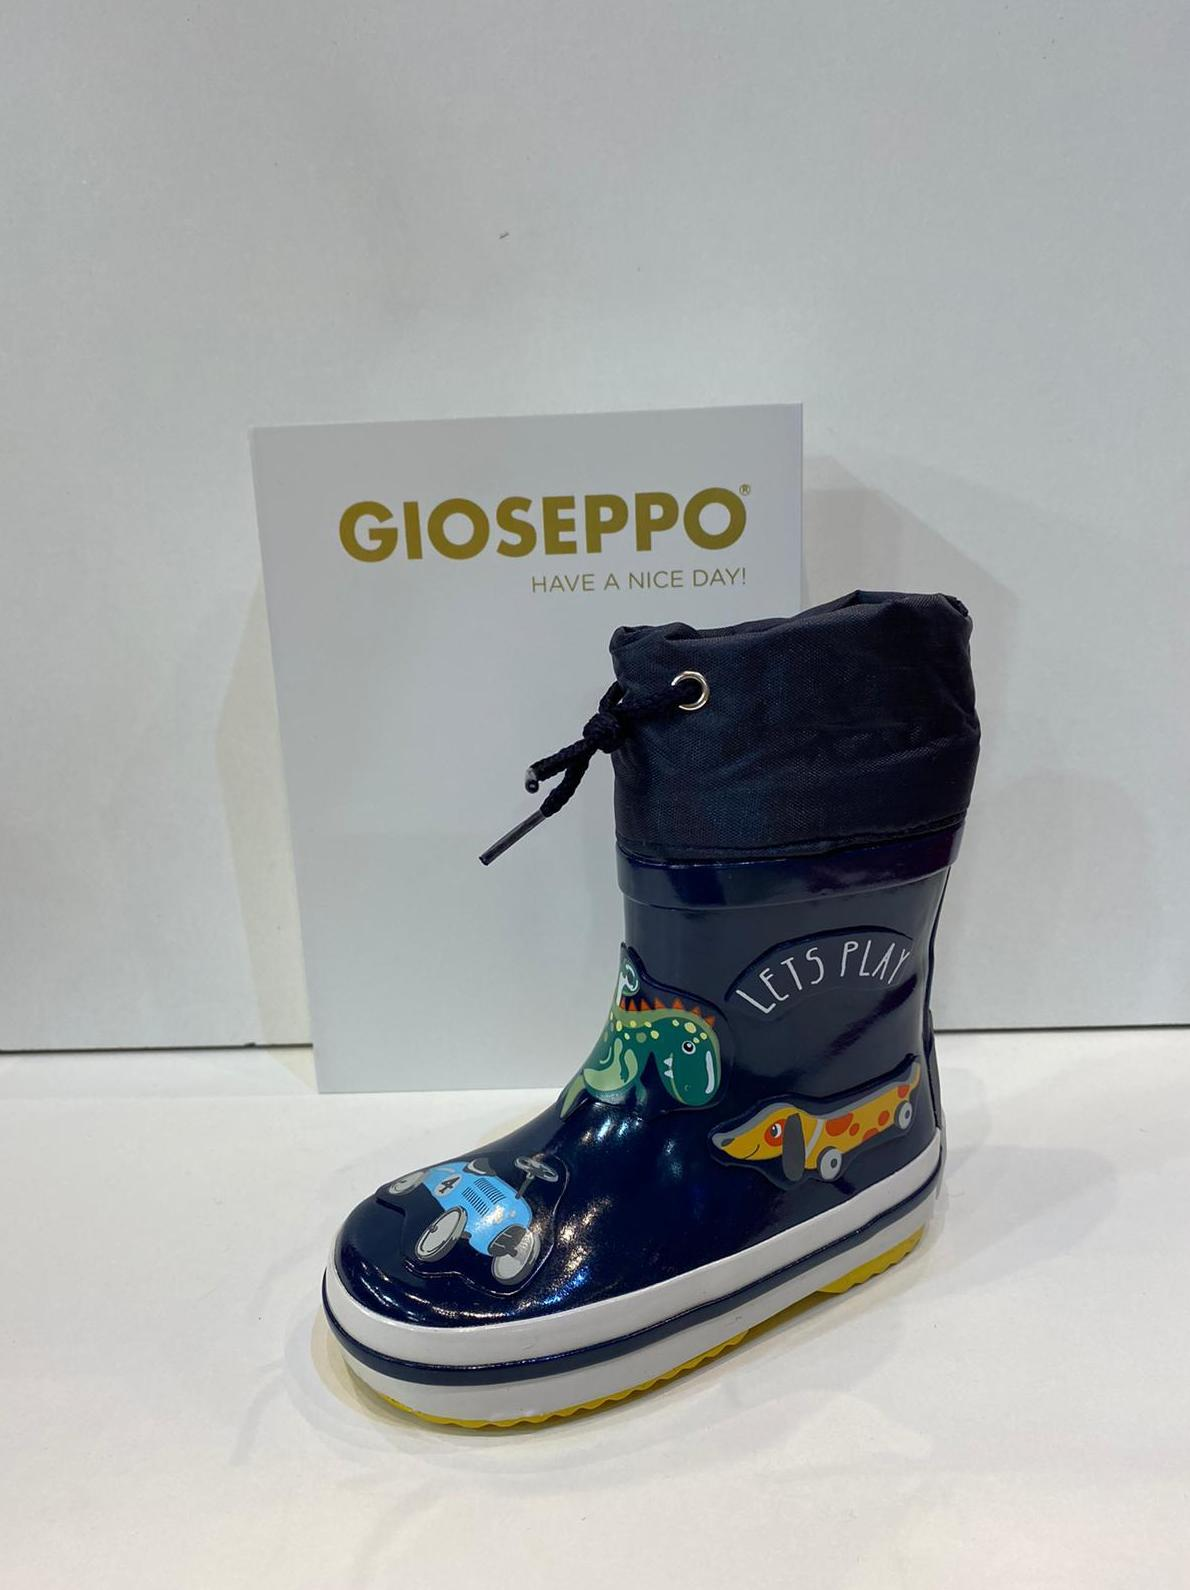 Bota d'aigua de nen, de la marca Gioseppo, de caucho 100% 24.95€